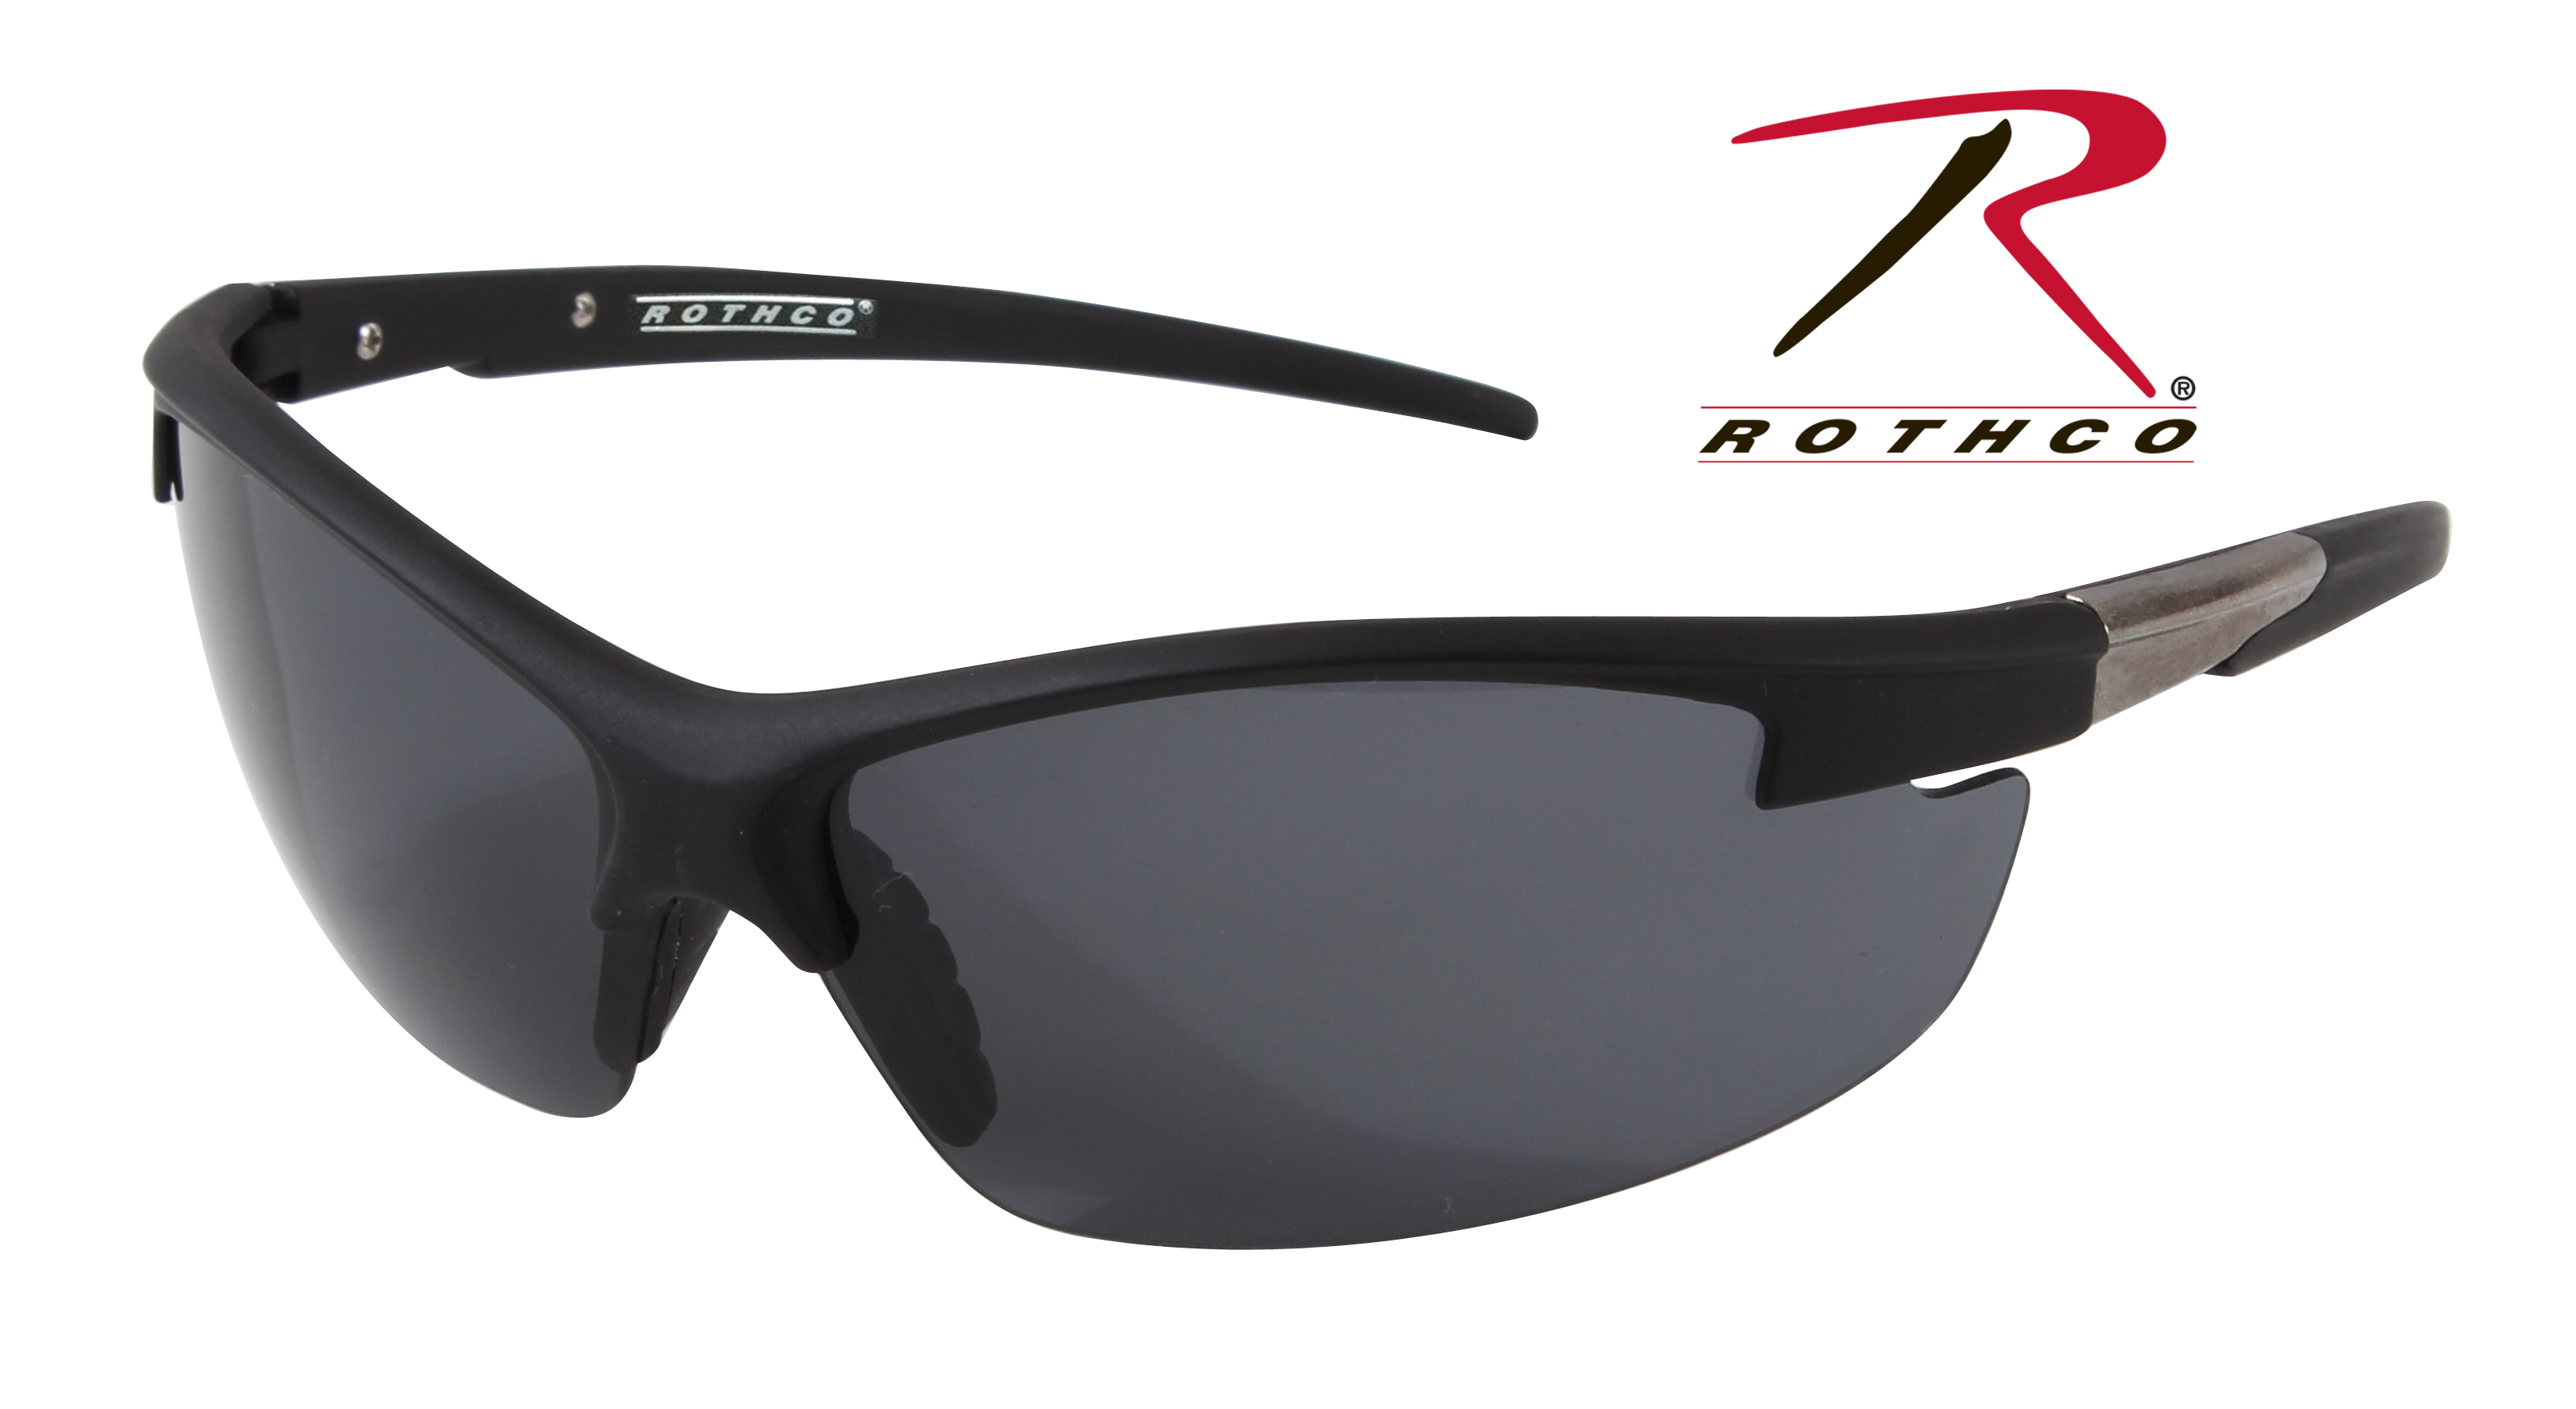 ОЧКИ AR-7 SPORT BLACK код ROTHCO 4353